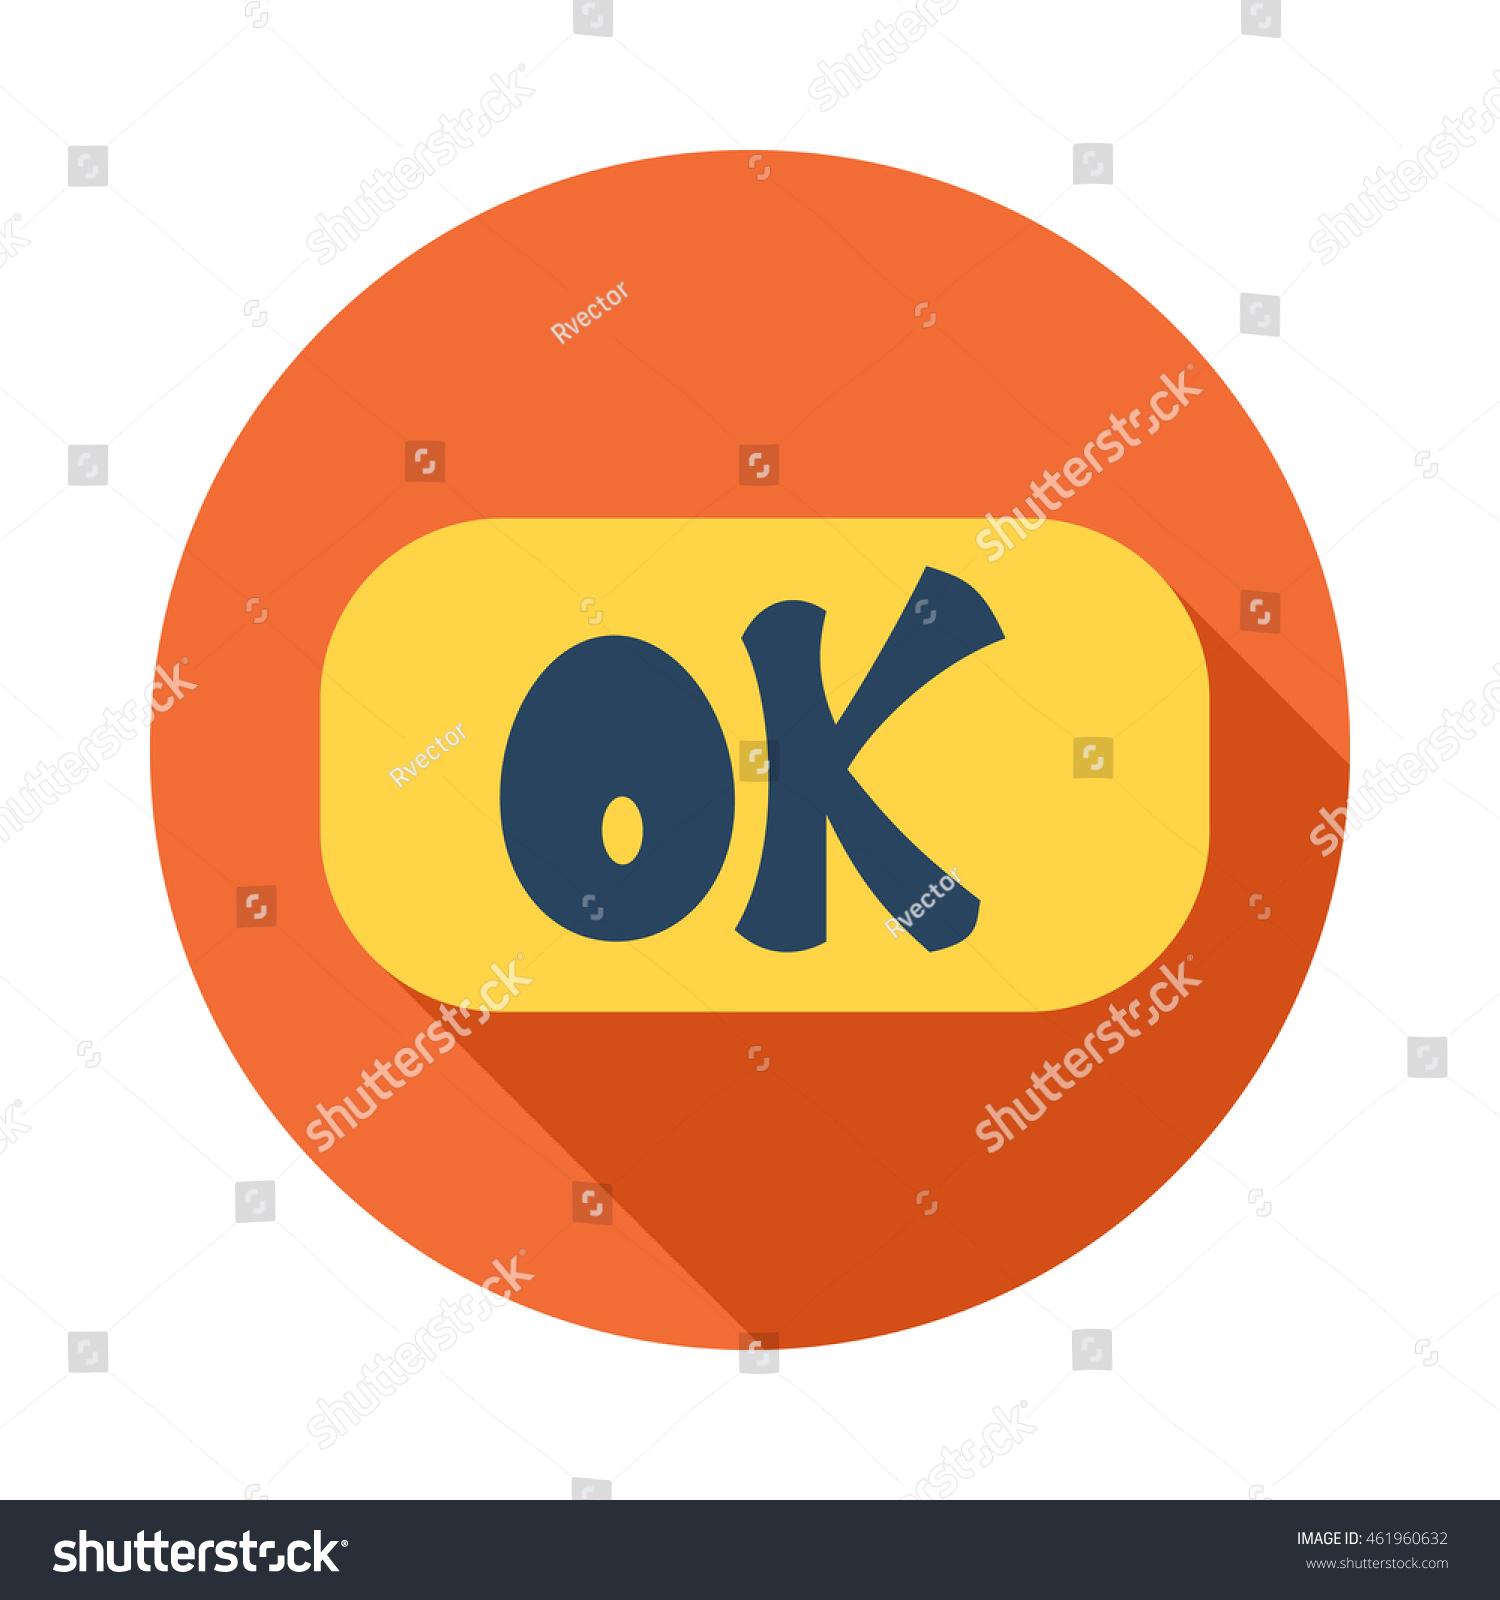 Word ok icon flat style long stock vector 461960632 shutterstock word ok icon in flat style with long shadow click and choice symbol buycottarizona